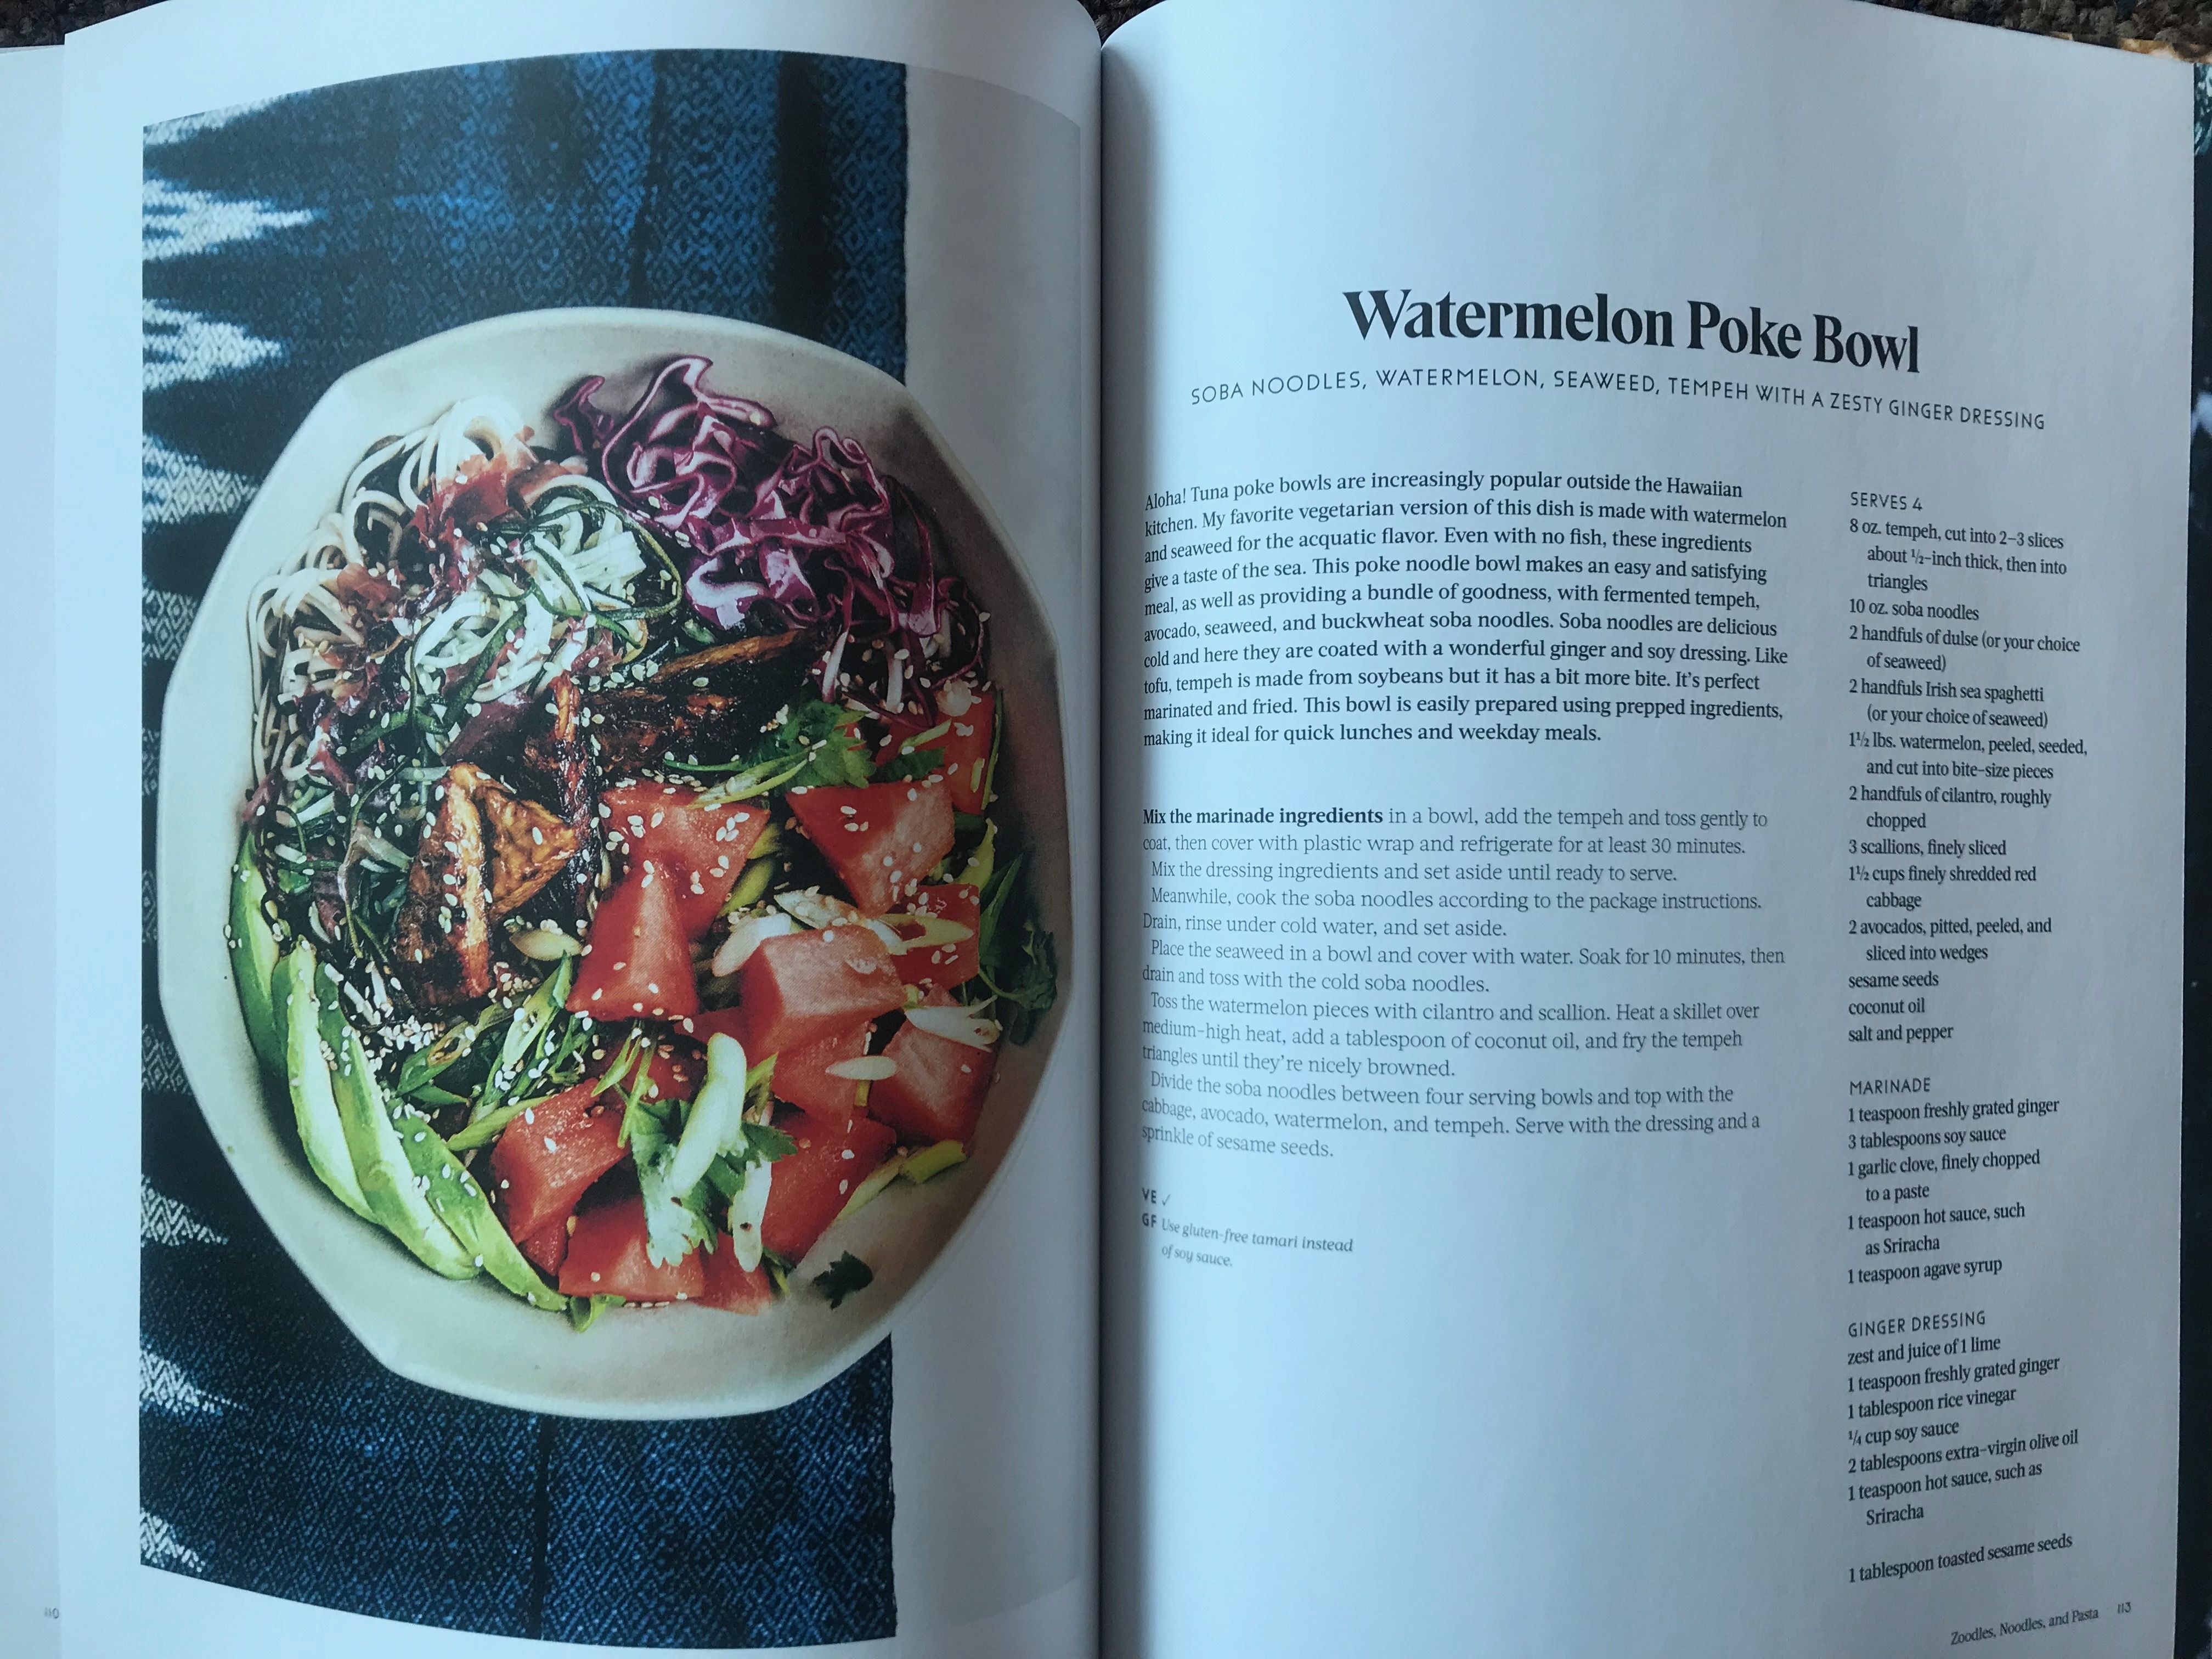 Pin by Faith MacArthur on Vegetarian | Pinterest | Salads